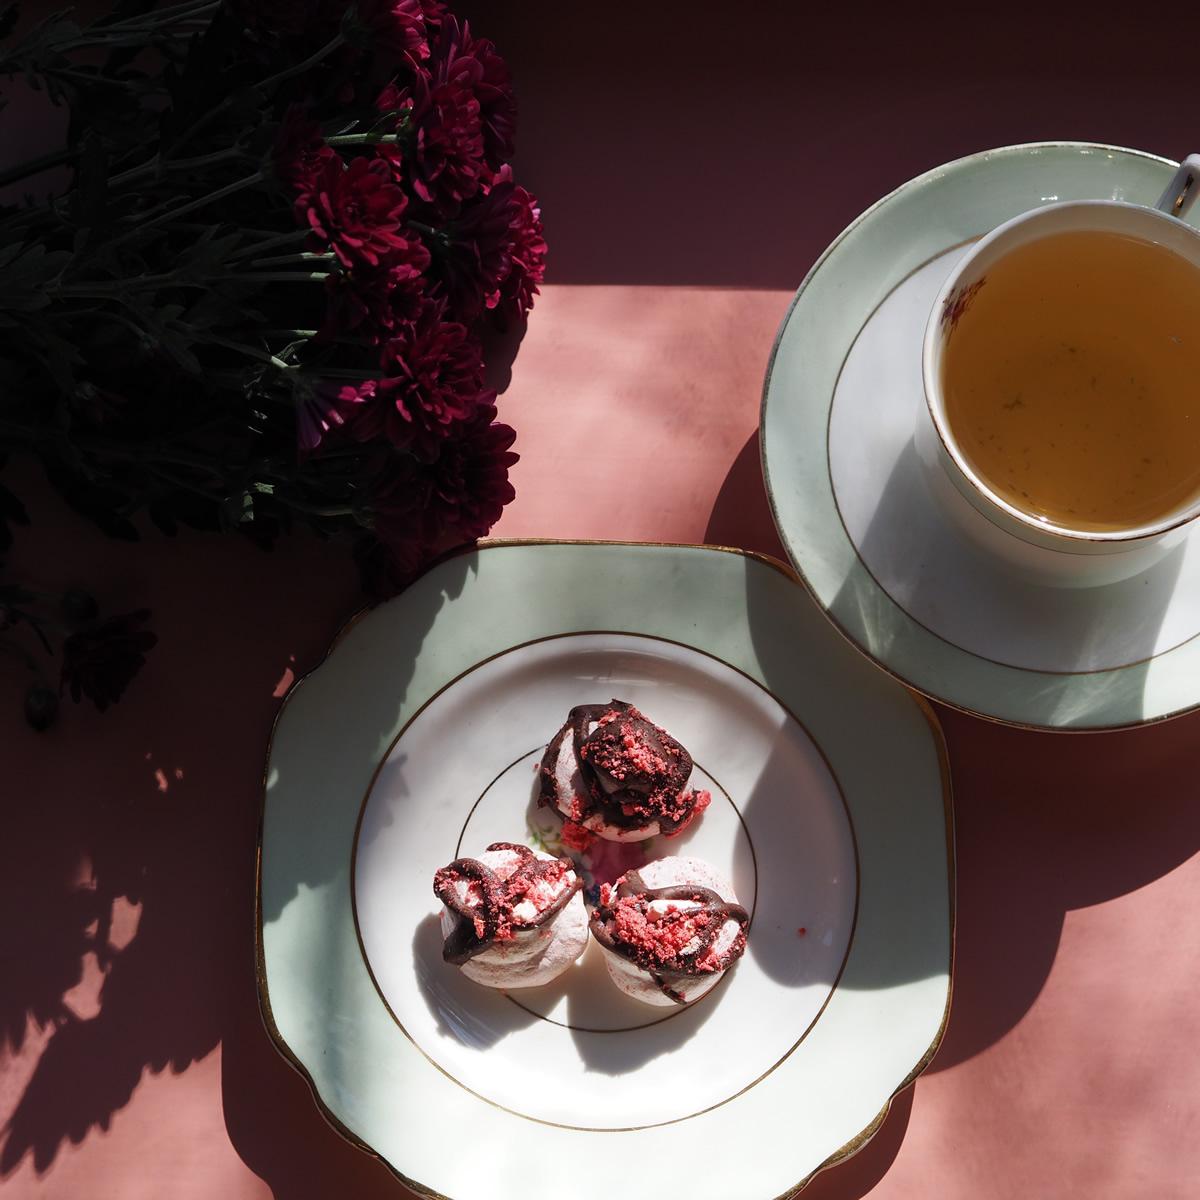 vegan aquafaba meringue kiss chocolate raspberry.jpg